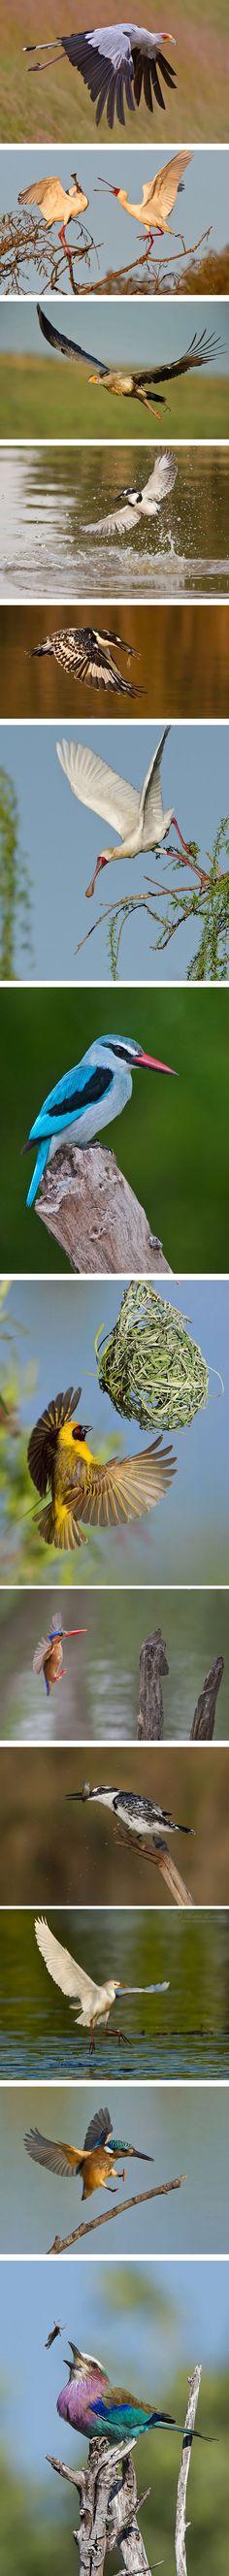 Photographer Morkel Erasmus #birds